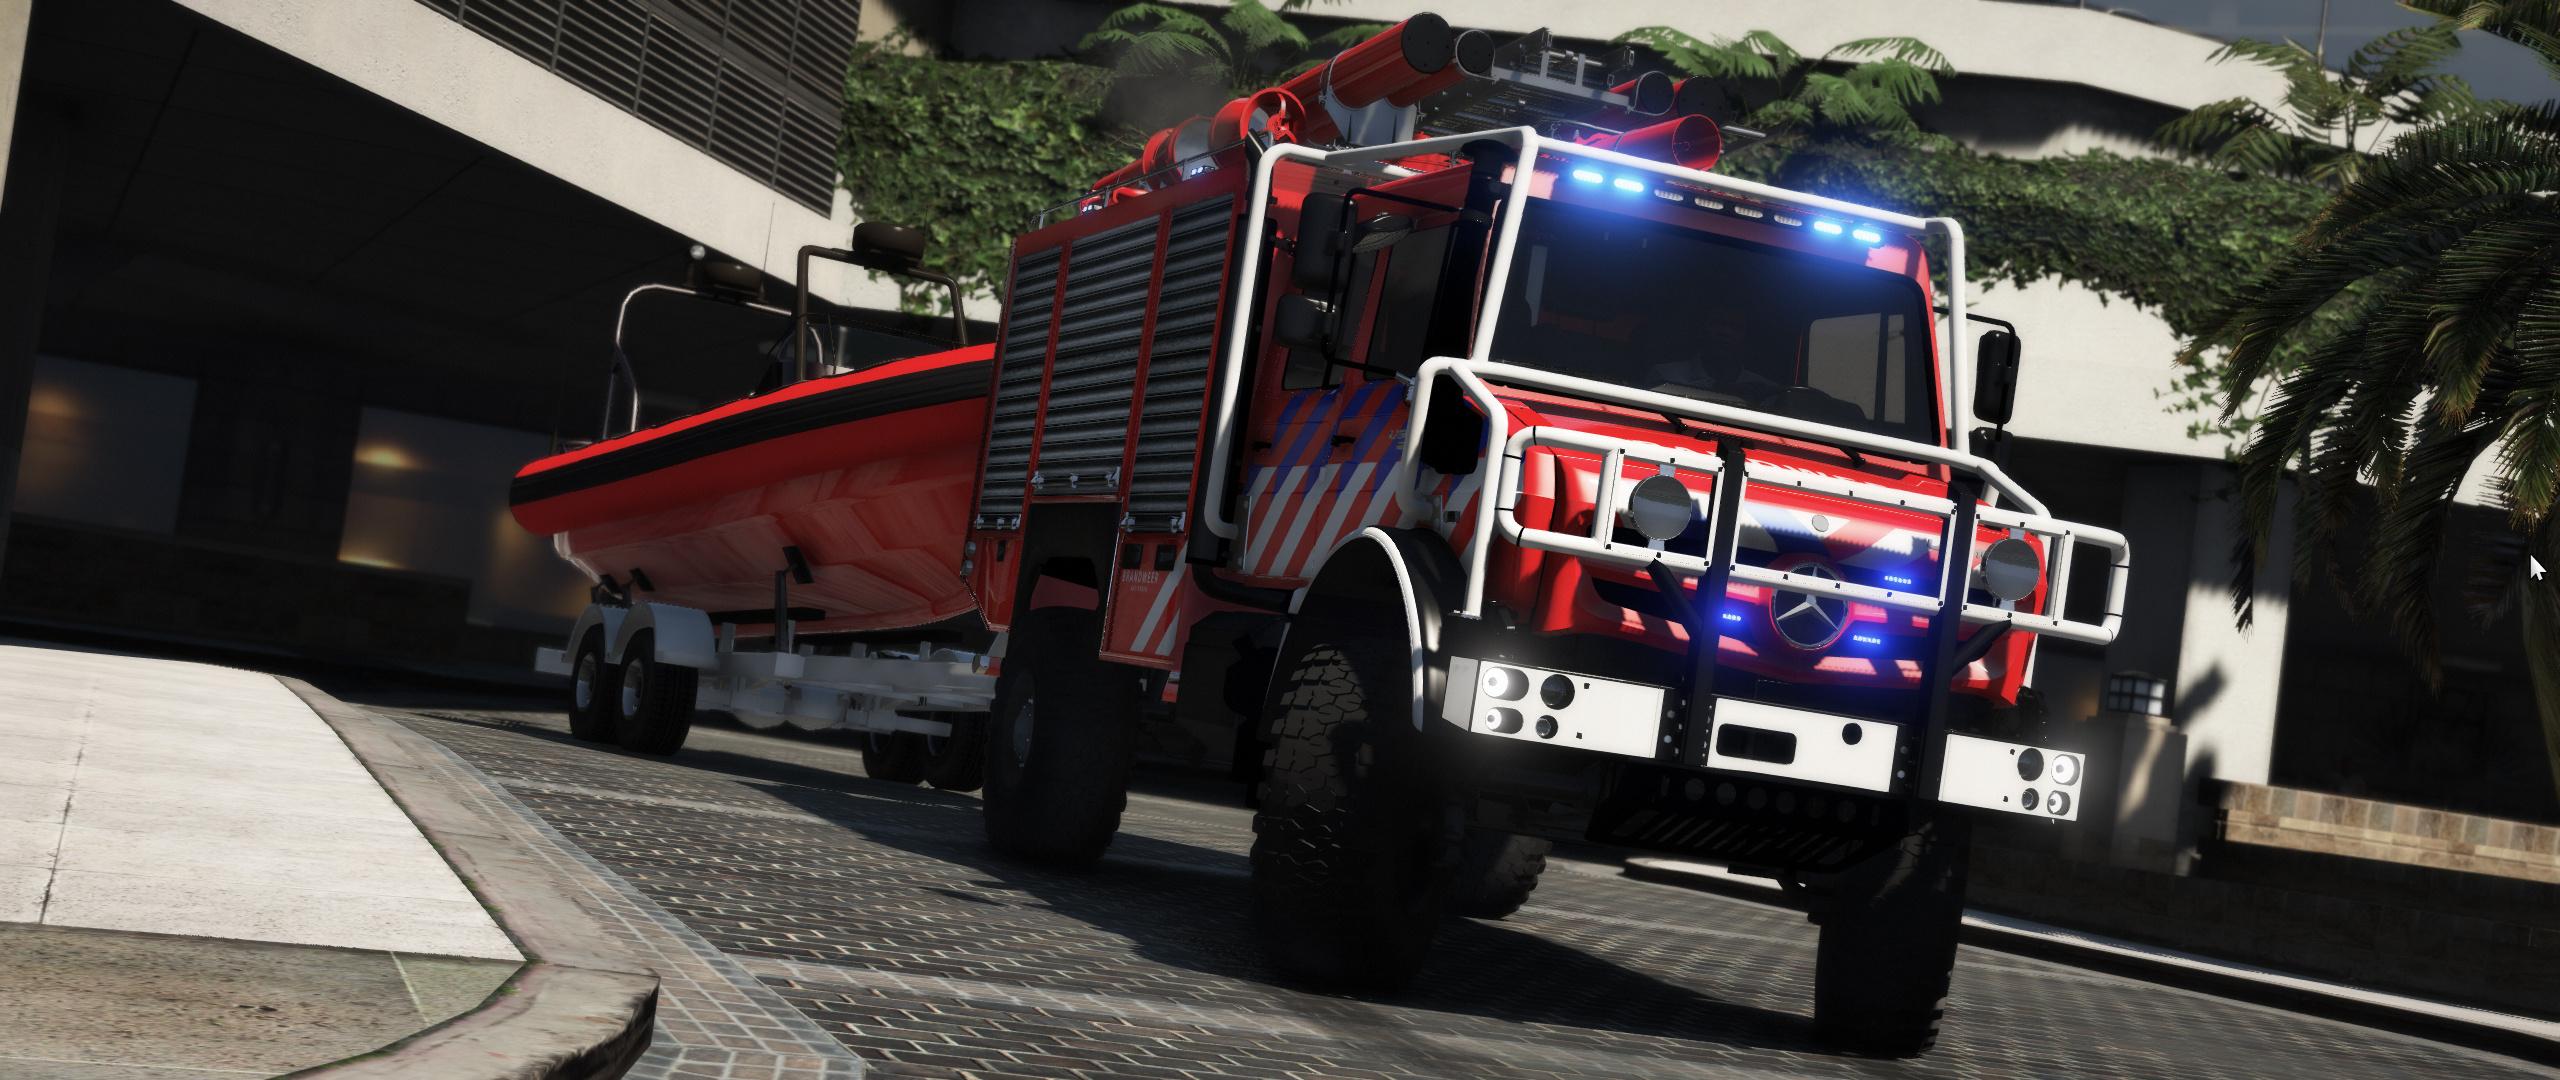 Off Road Fire Truck >> Mercedes Benz Unimog Offroad Firetruck W Boattrailer